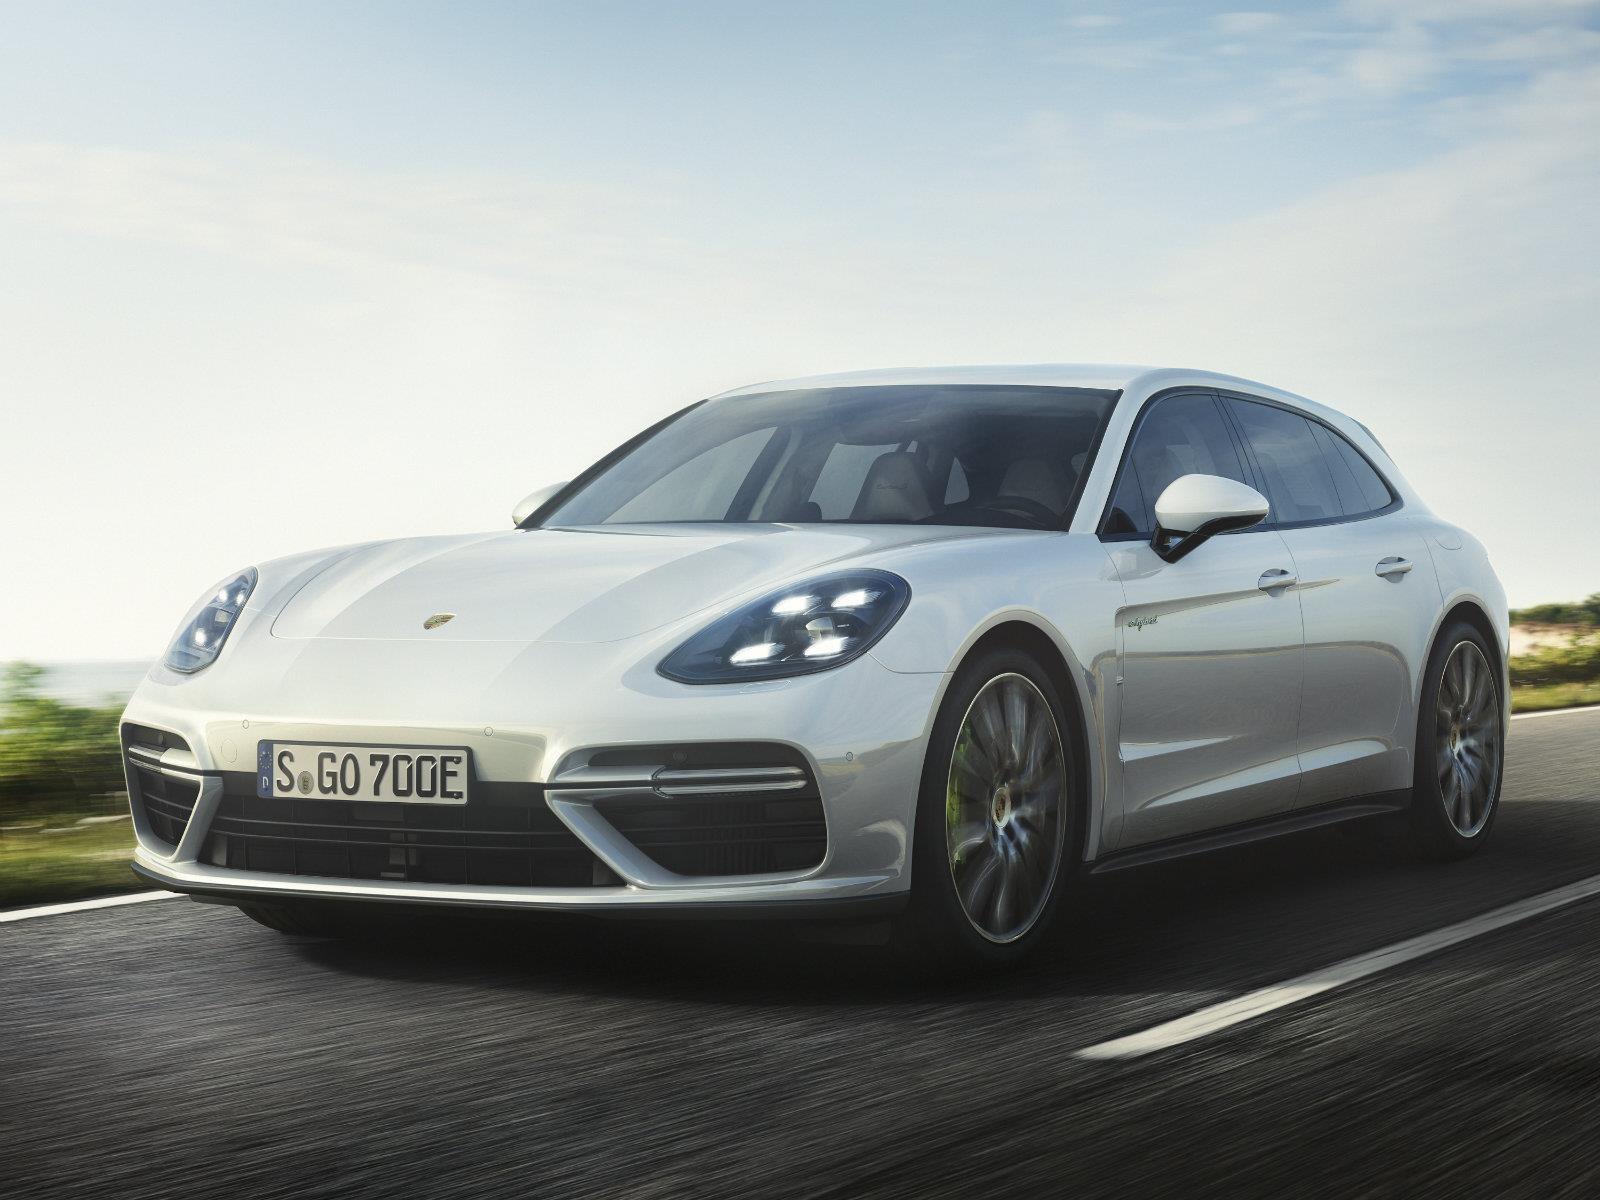 Porsche Panamera Turbo S E-Hybrid Sport Turismo 2018, más versátil